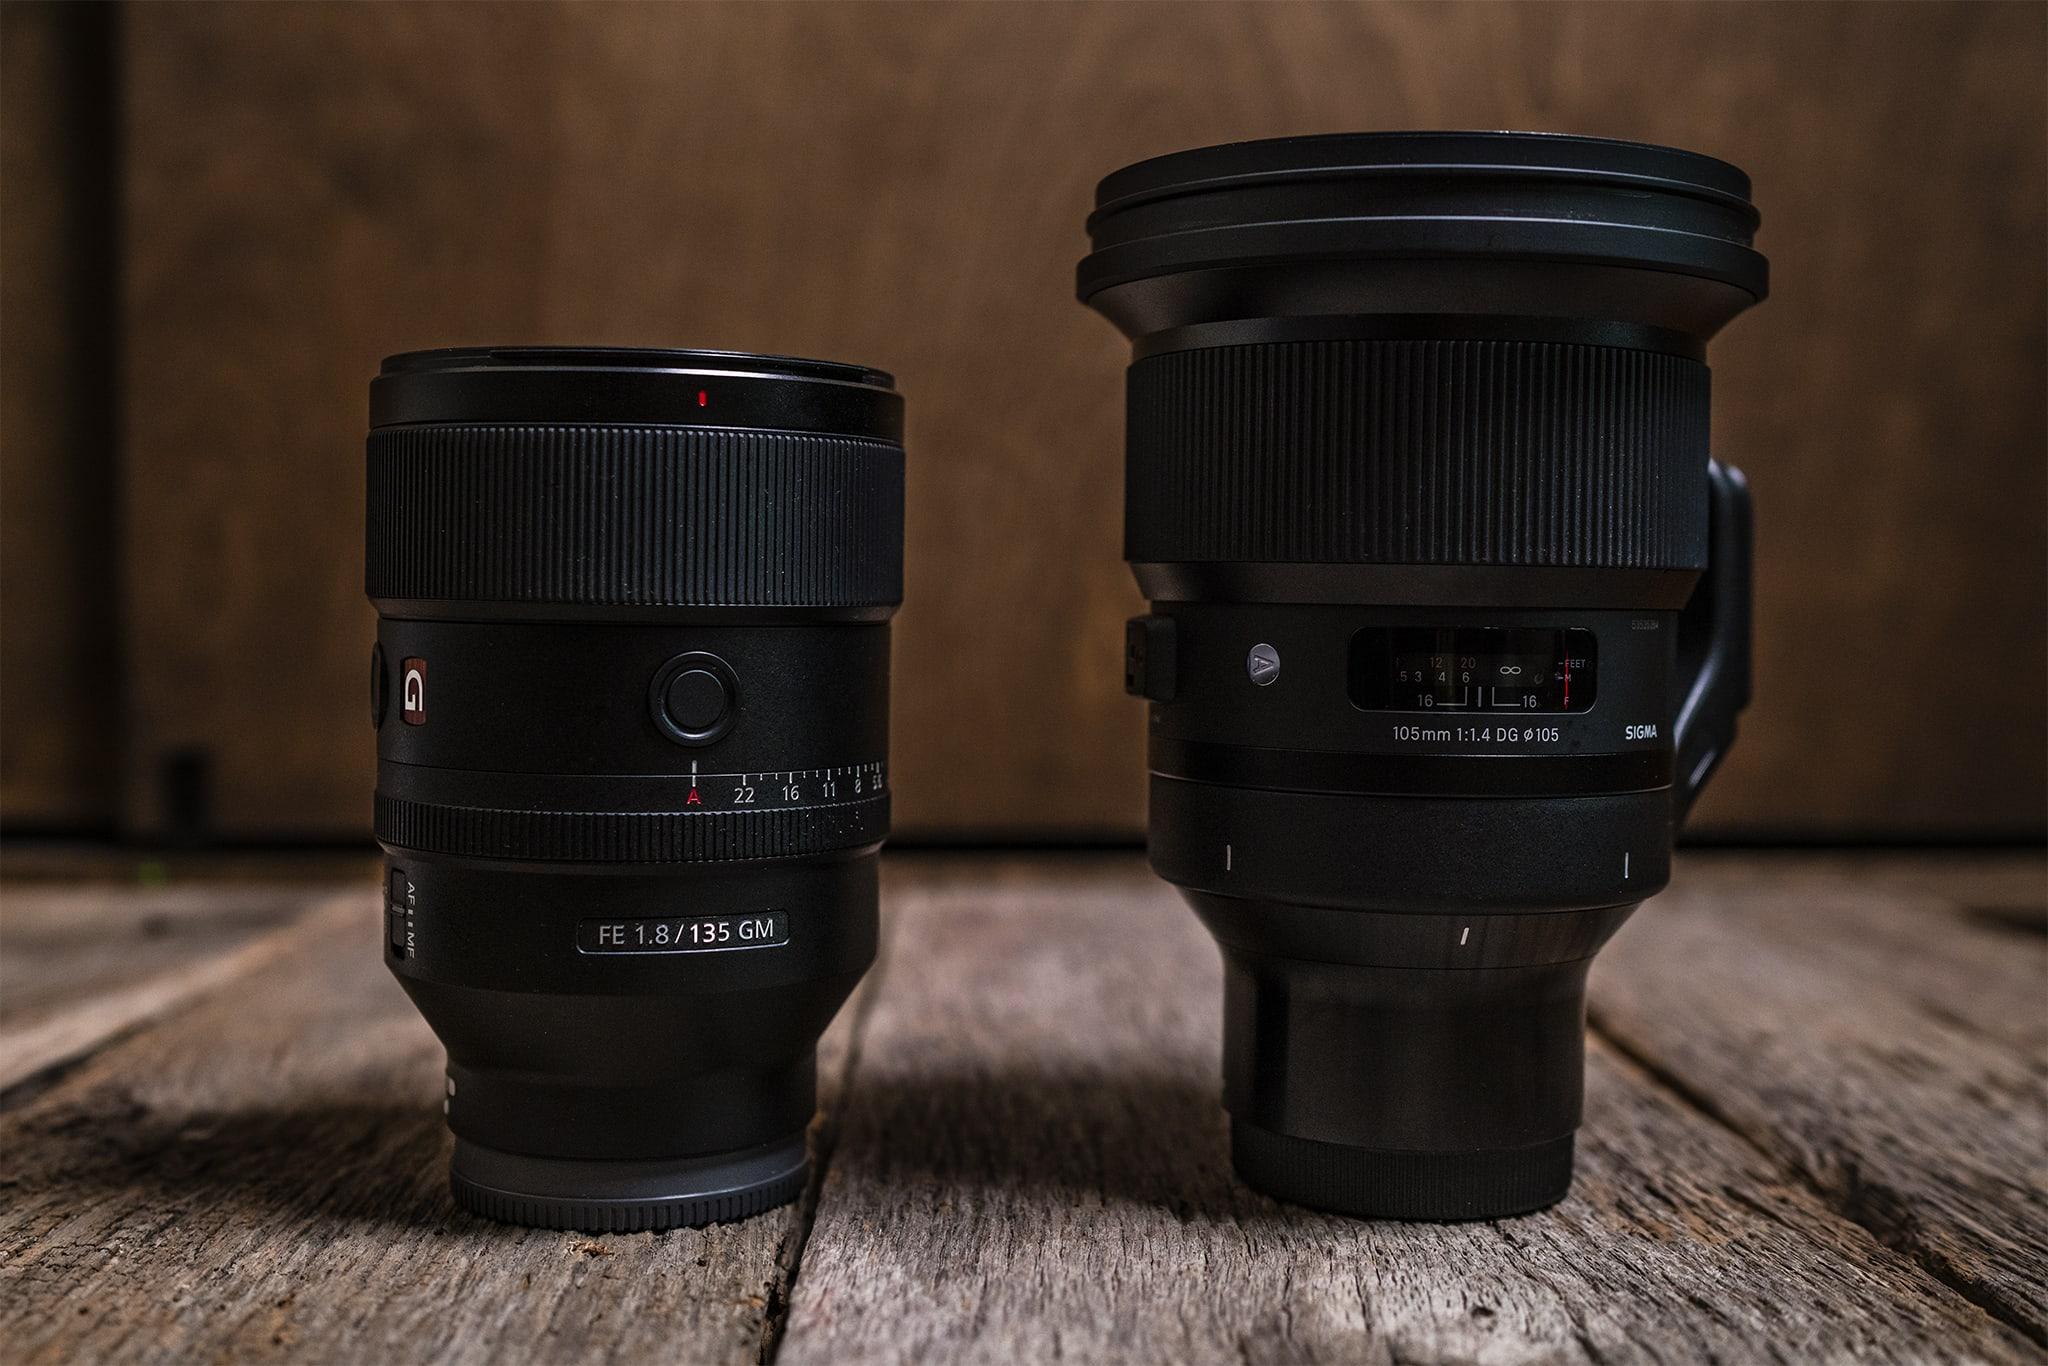 Best Prime Telephoto Lenses for Sony - Sony 135 Review